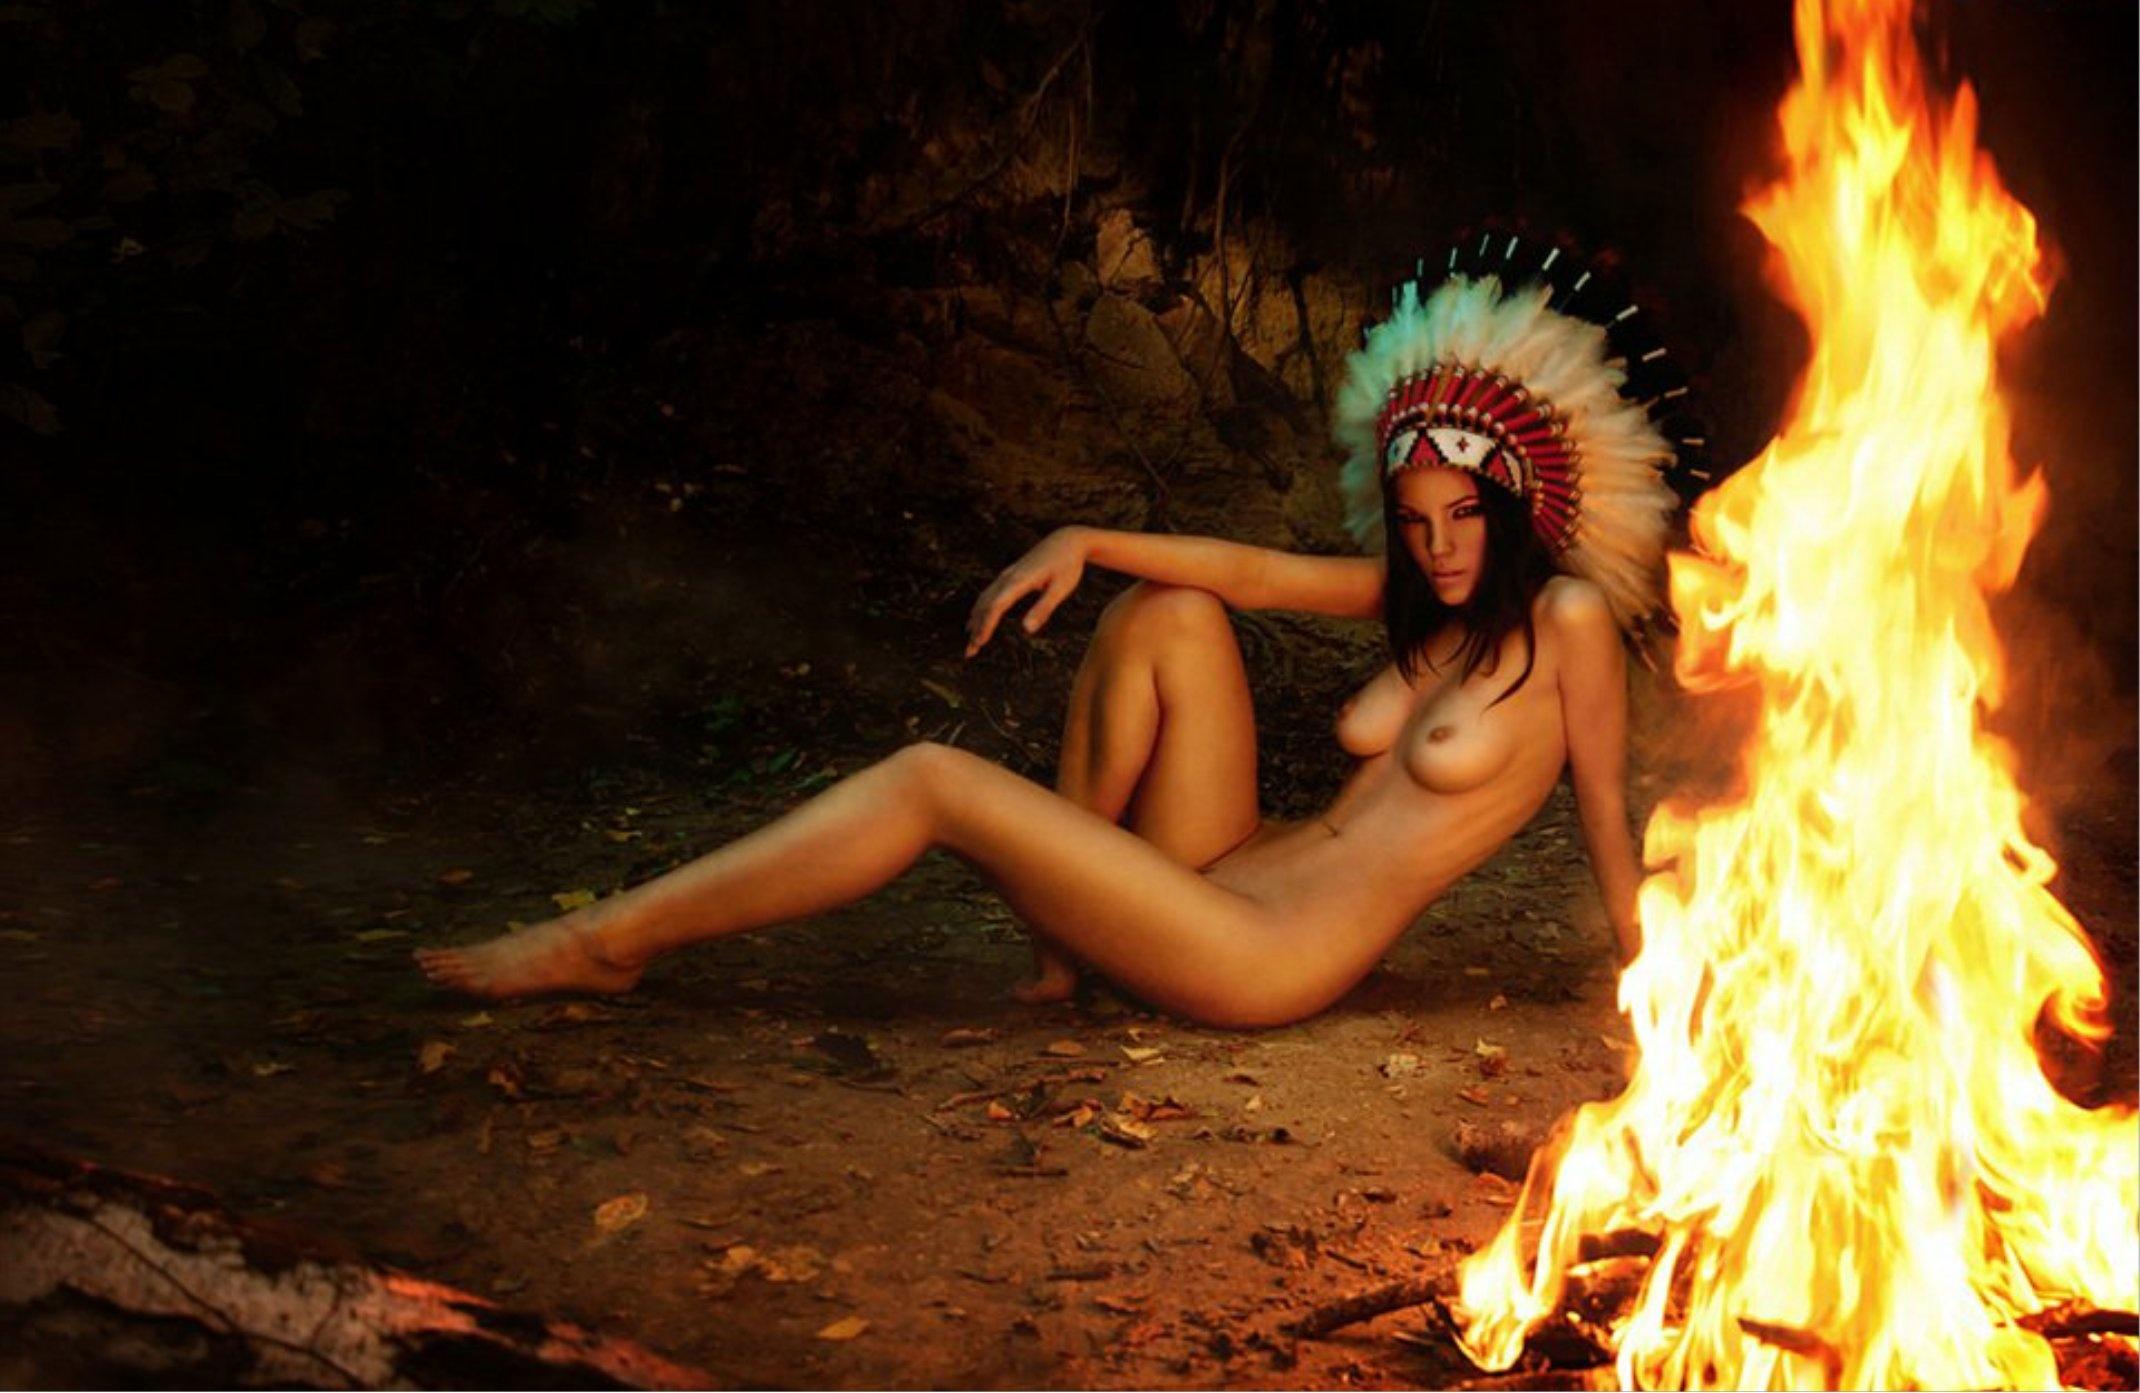 Индейцы девушки фото порно, брюнетка миа порно онлайн